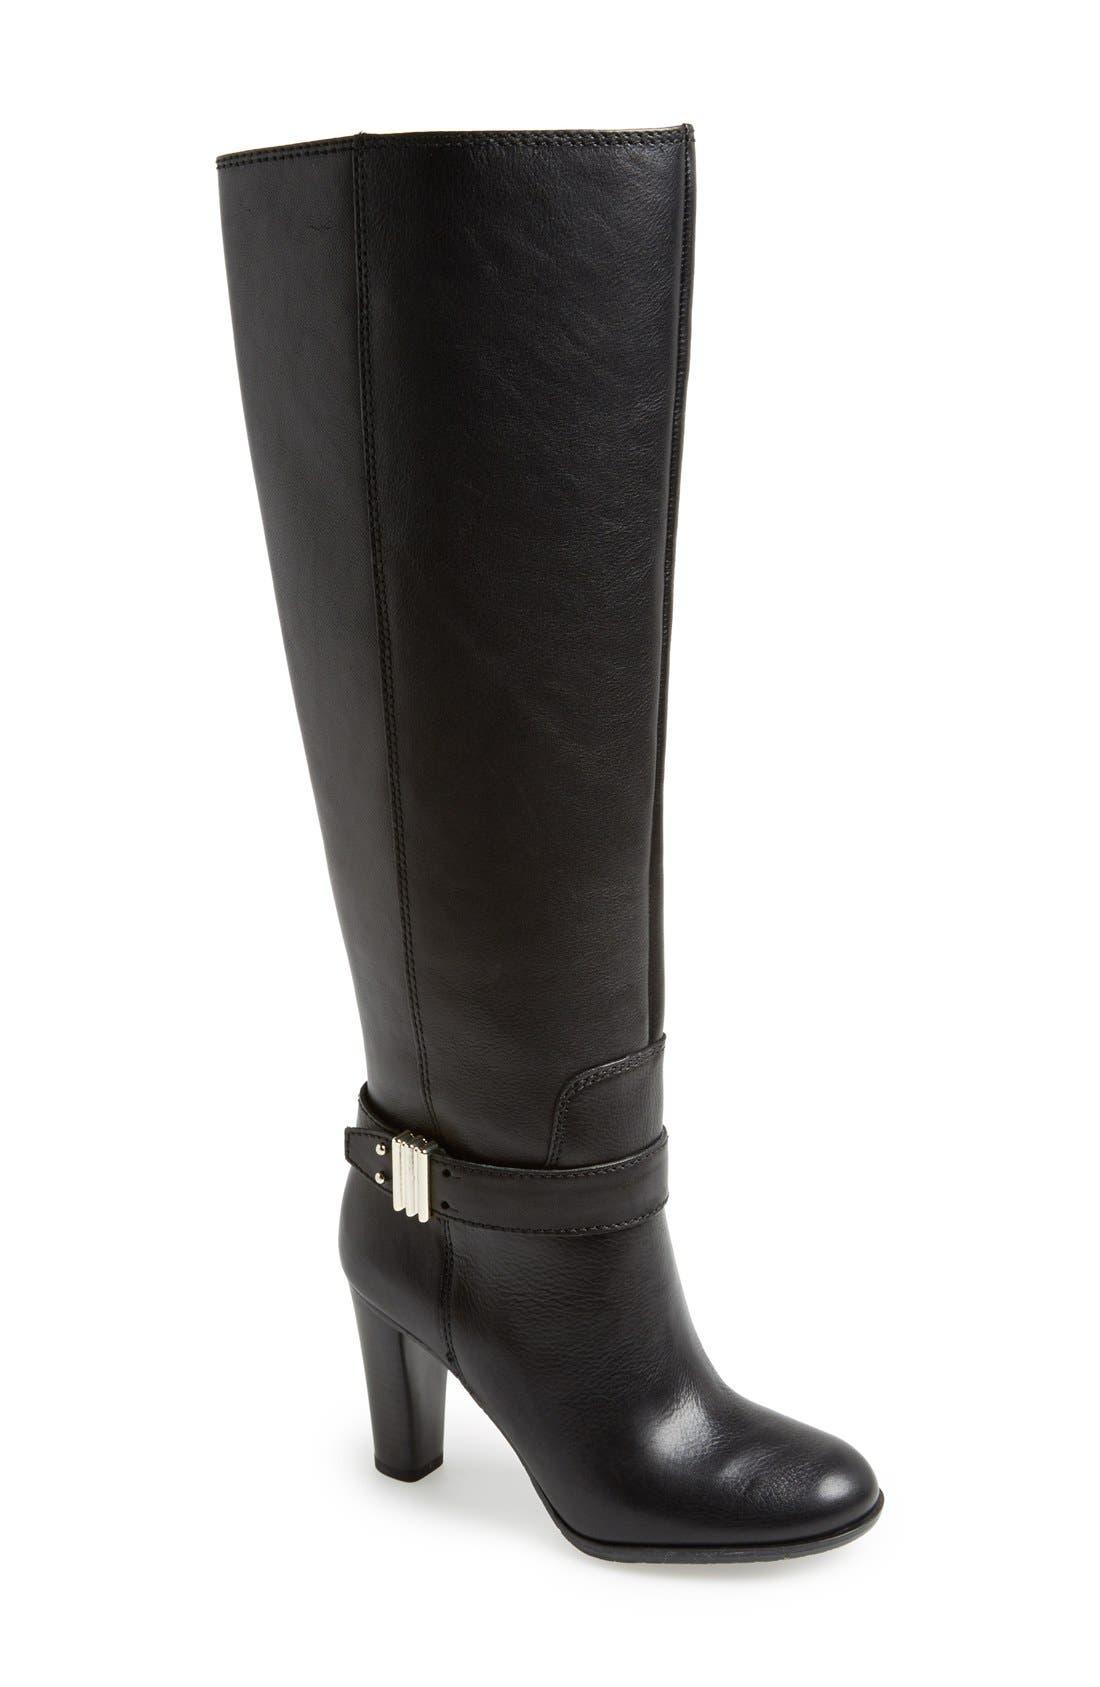 Main Image - Enzo Angiolini 'Sumilo' Boot (Wide Calf) (Women)